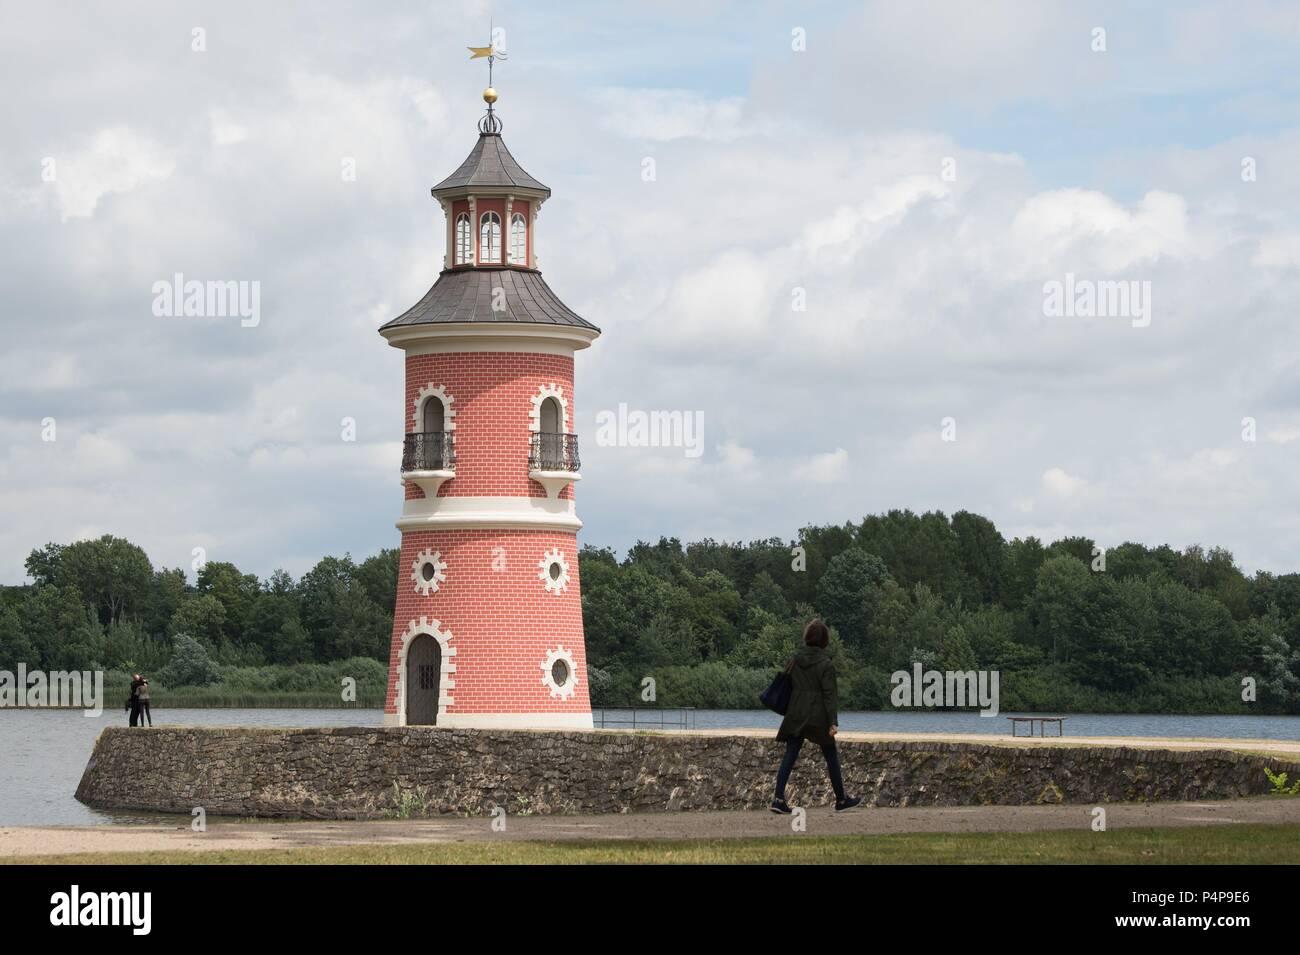 Moritzburg, Germany. 22nd June, 2018. A woman walks along a jetty in front of the lighthouse. Credit: Sebastian Kahnert/dpa-Zentralbild/ZB/dpa/Alamy Live News Stock Photo